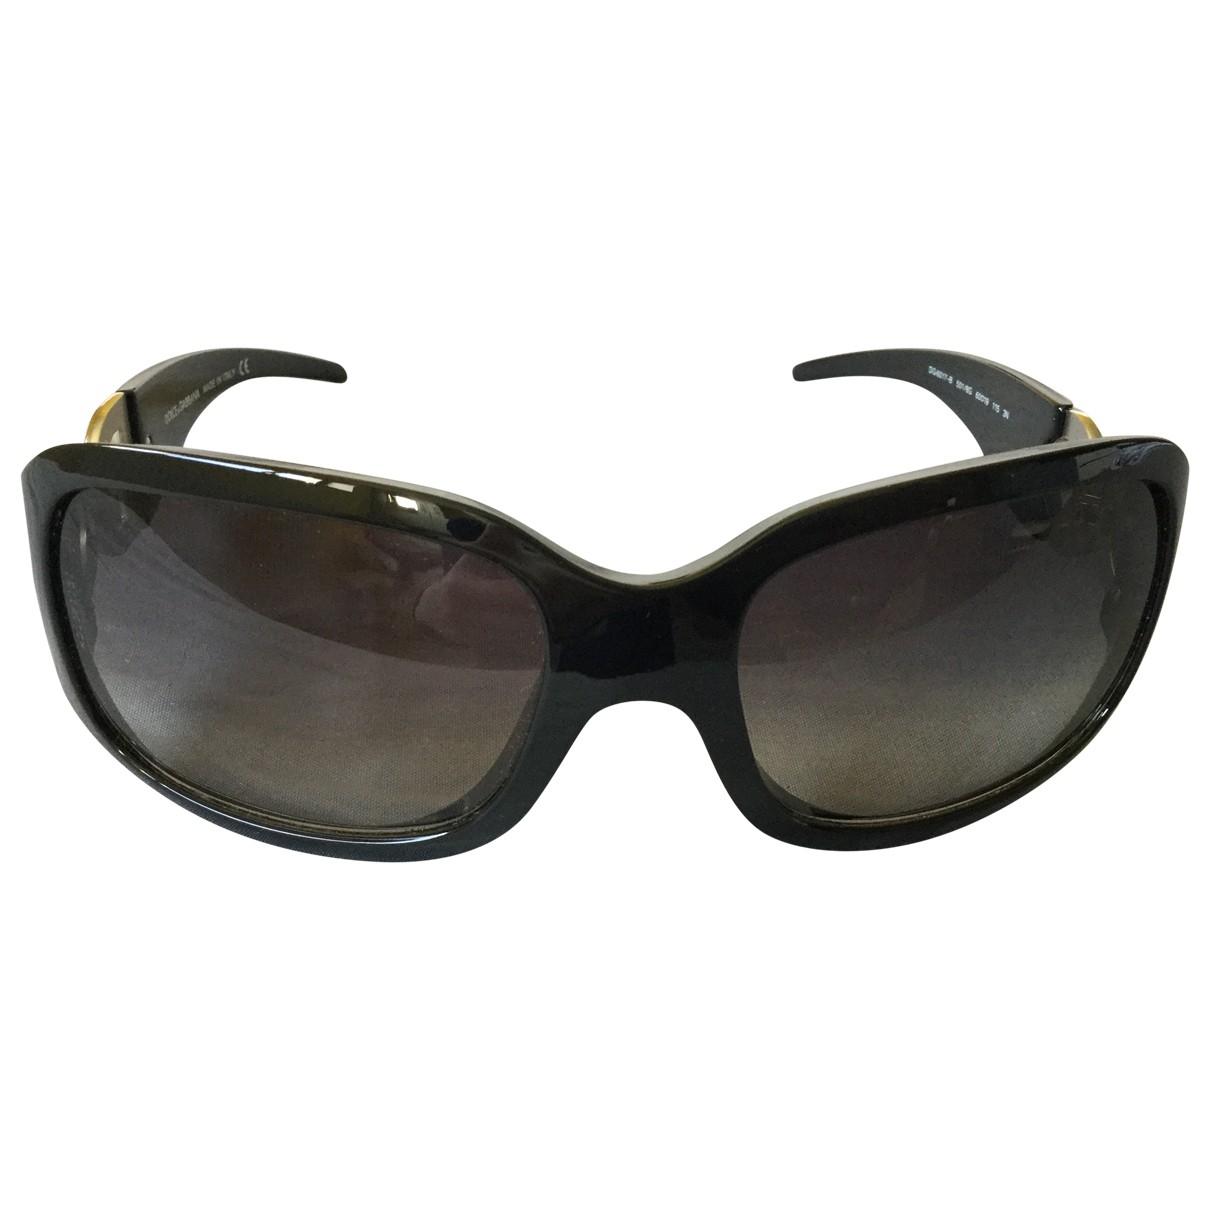 Gafas D&g